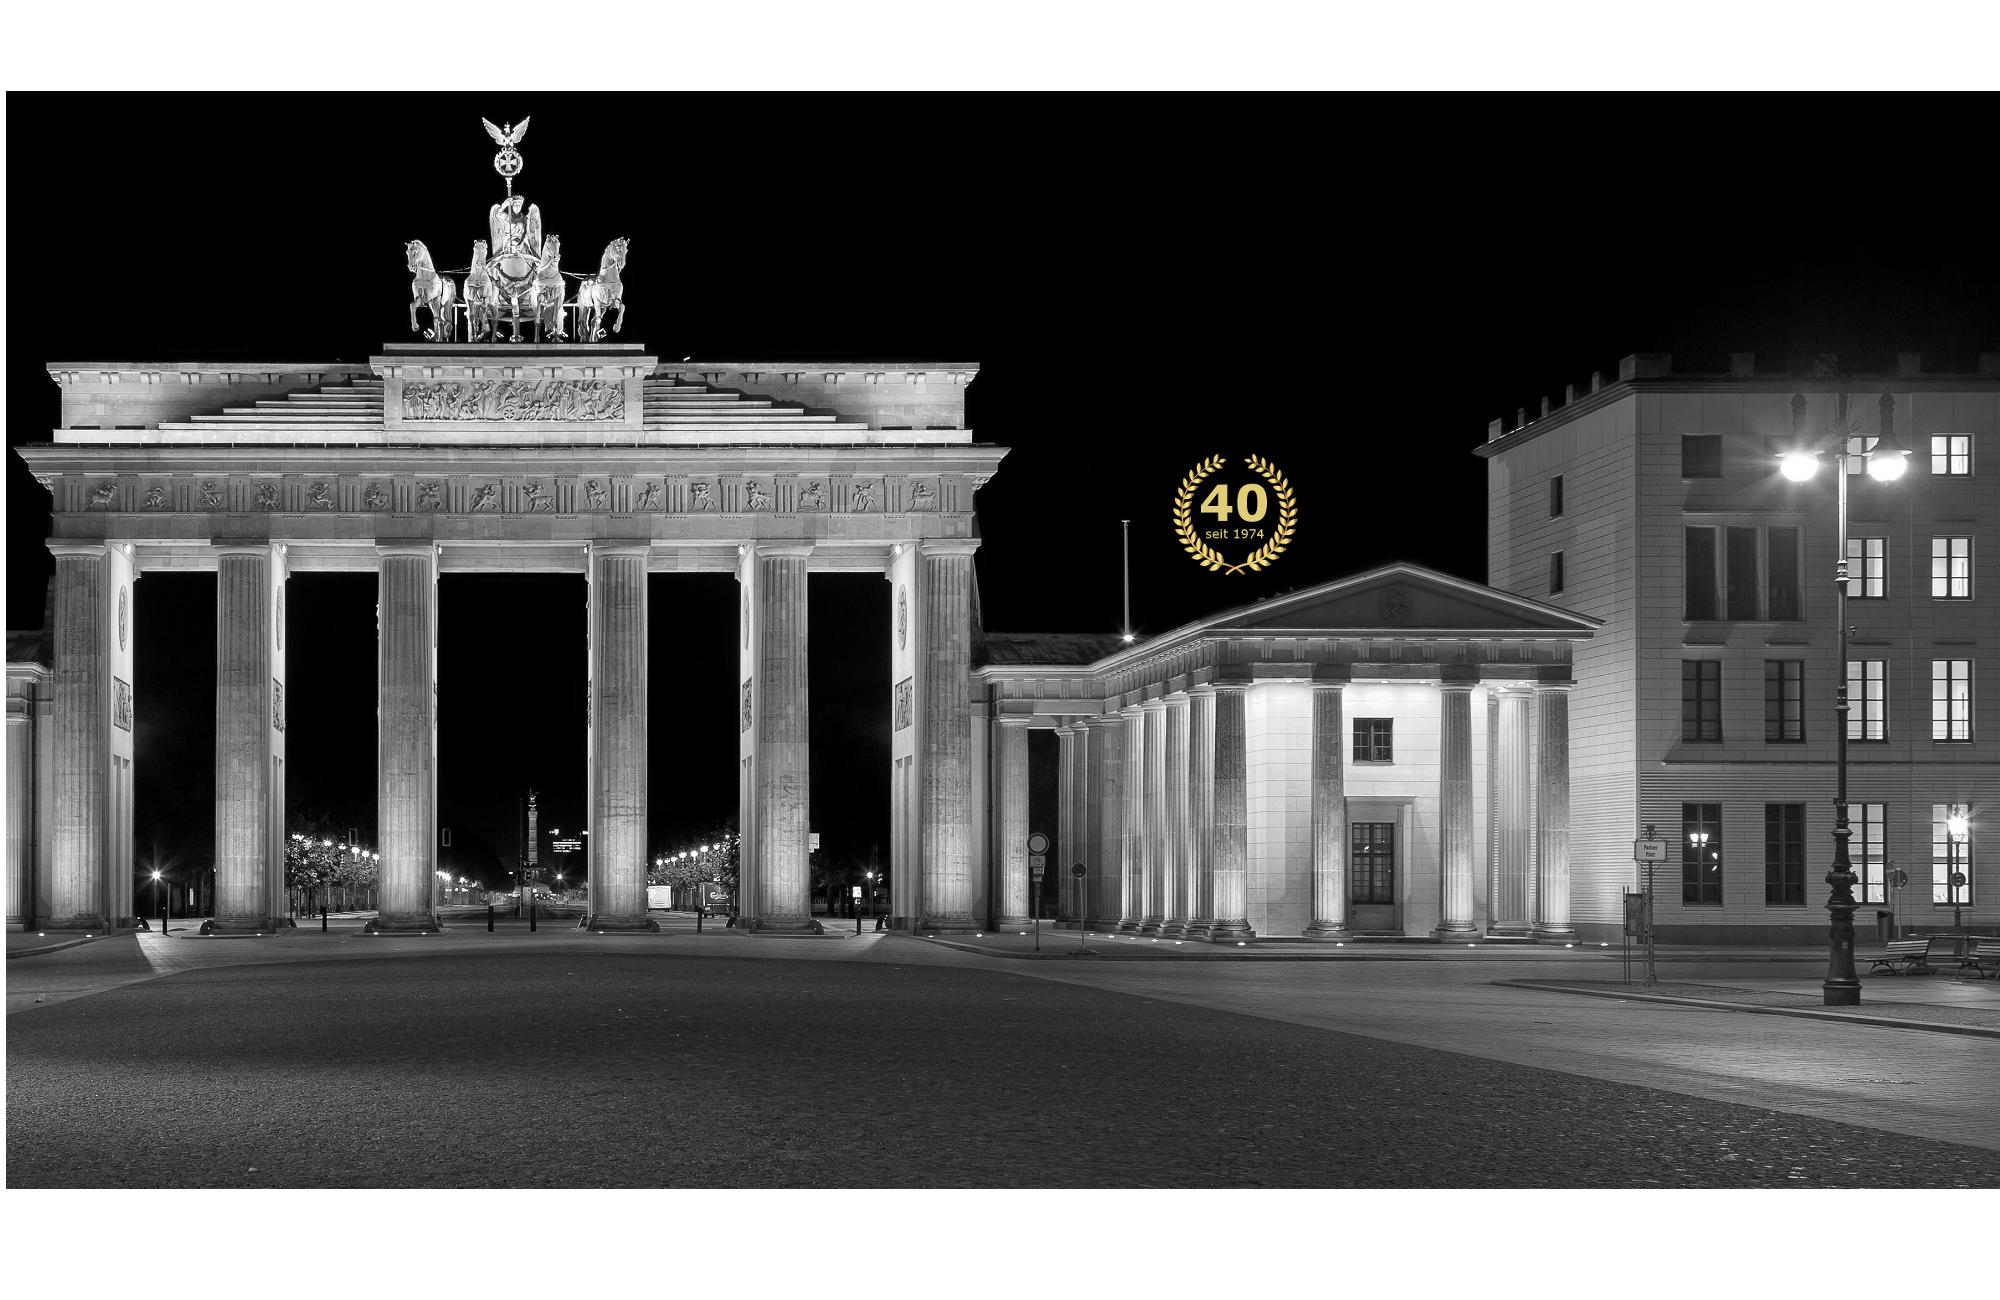 Polsterei Berlin Pankow kontakt polsterei berlin manfred kranz